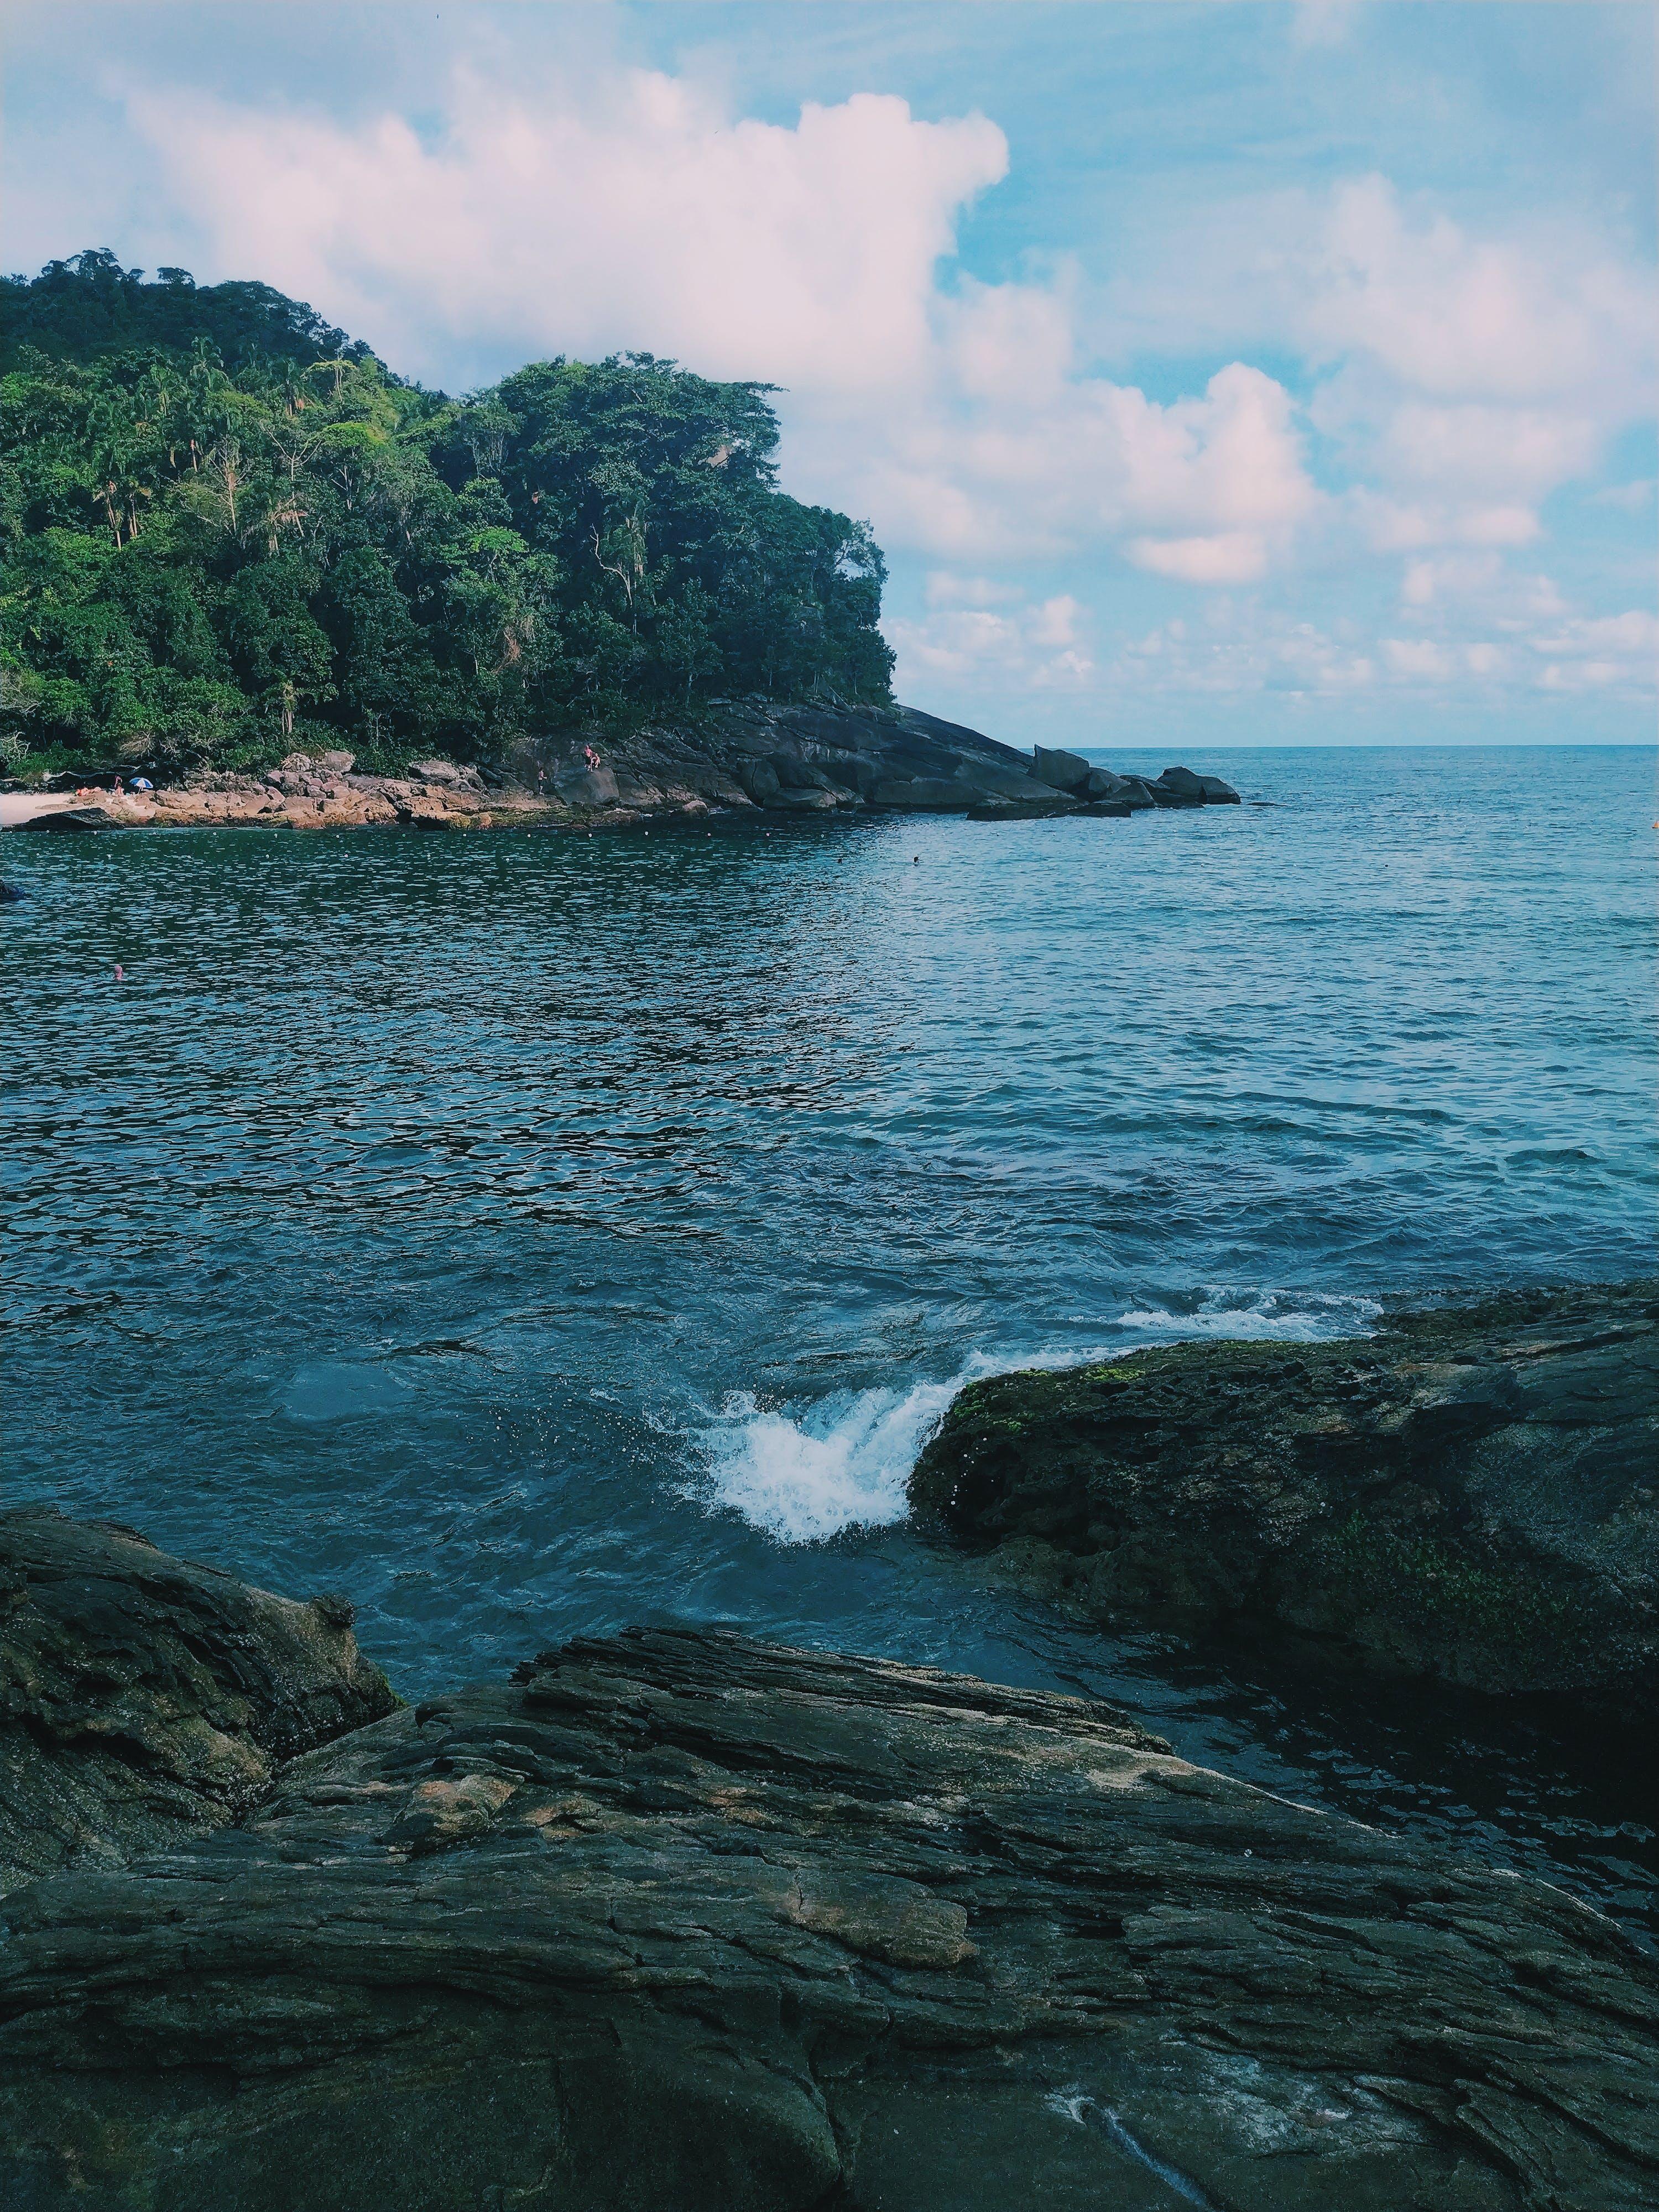 Free stock photo of beach, blue sky, brazil, calm